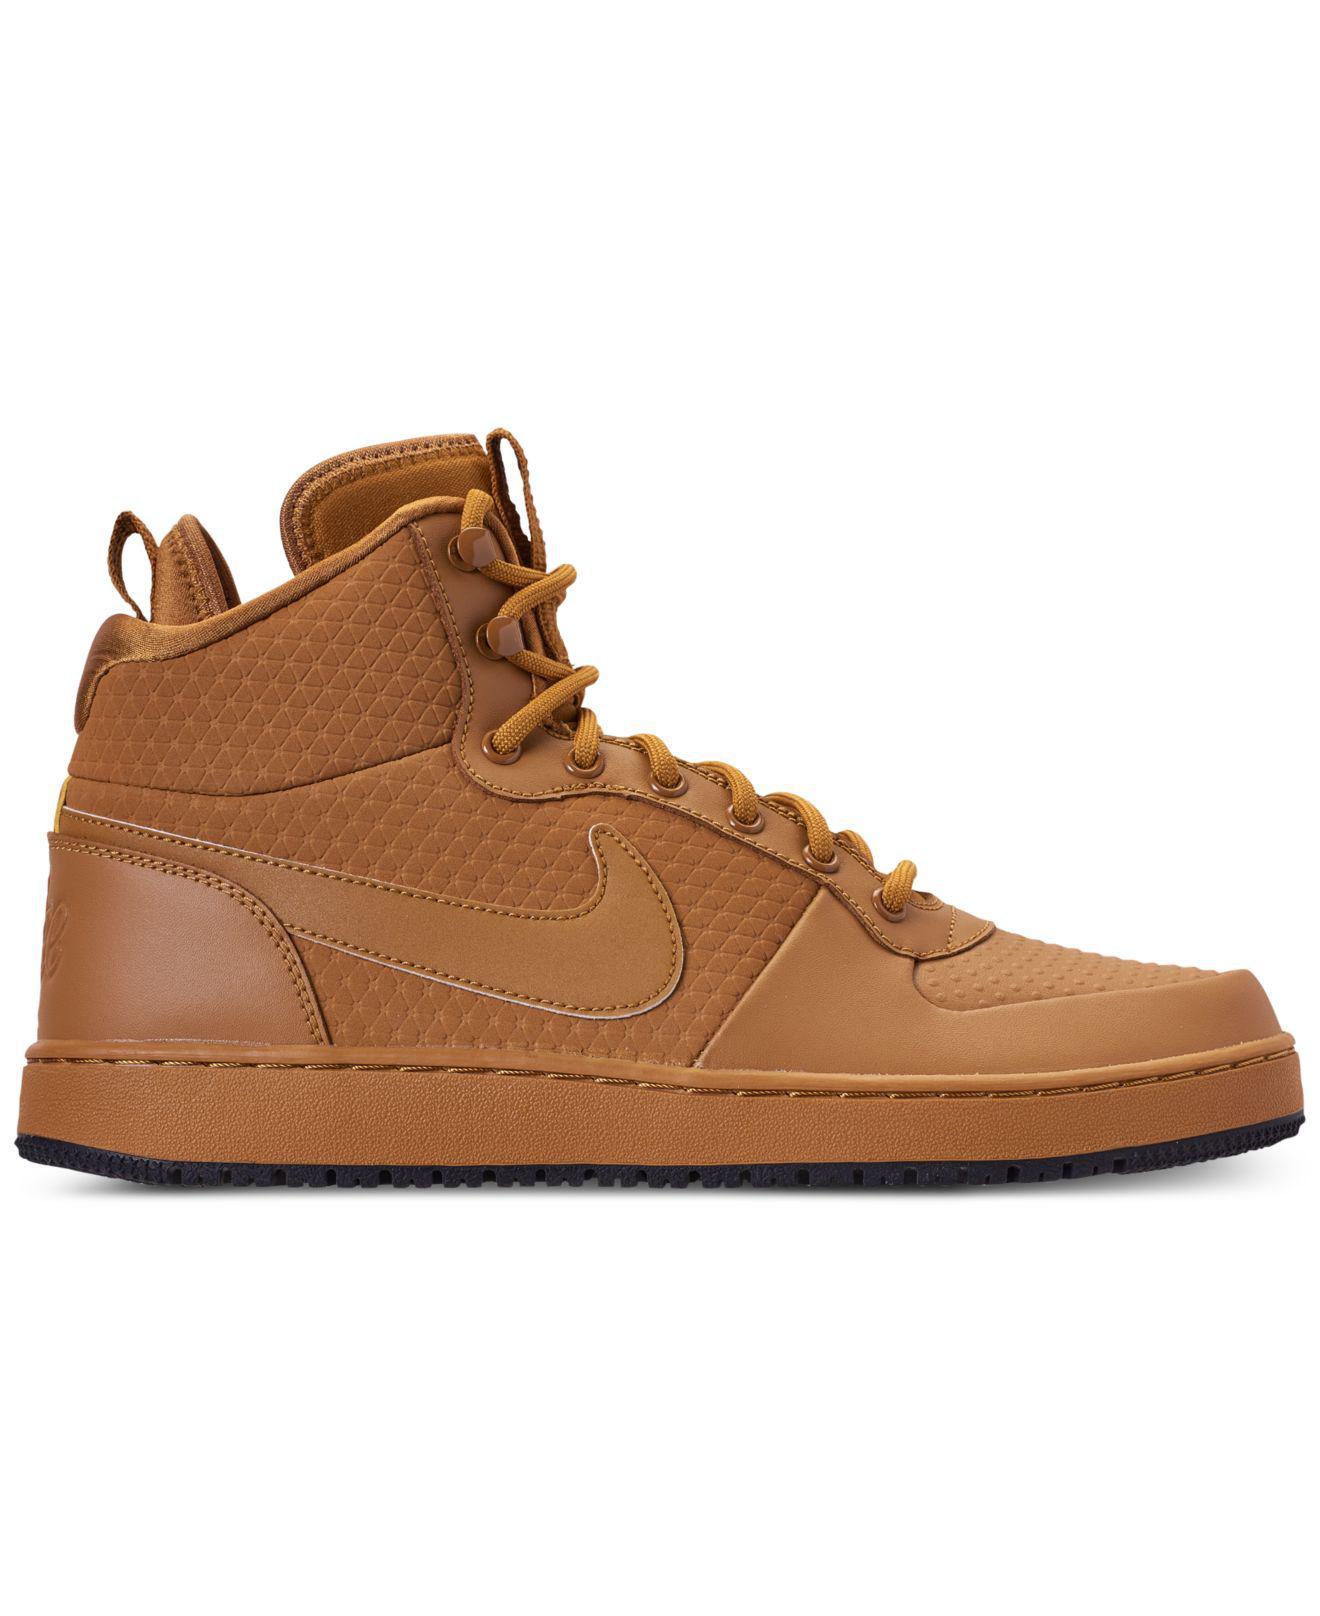 Ebernon Winter Mid Top Sneakers